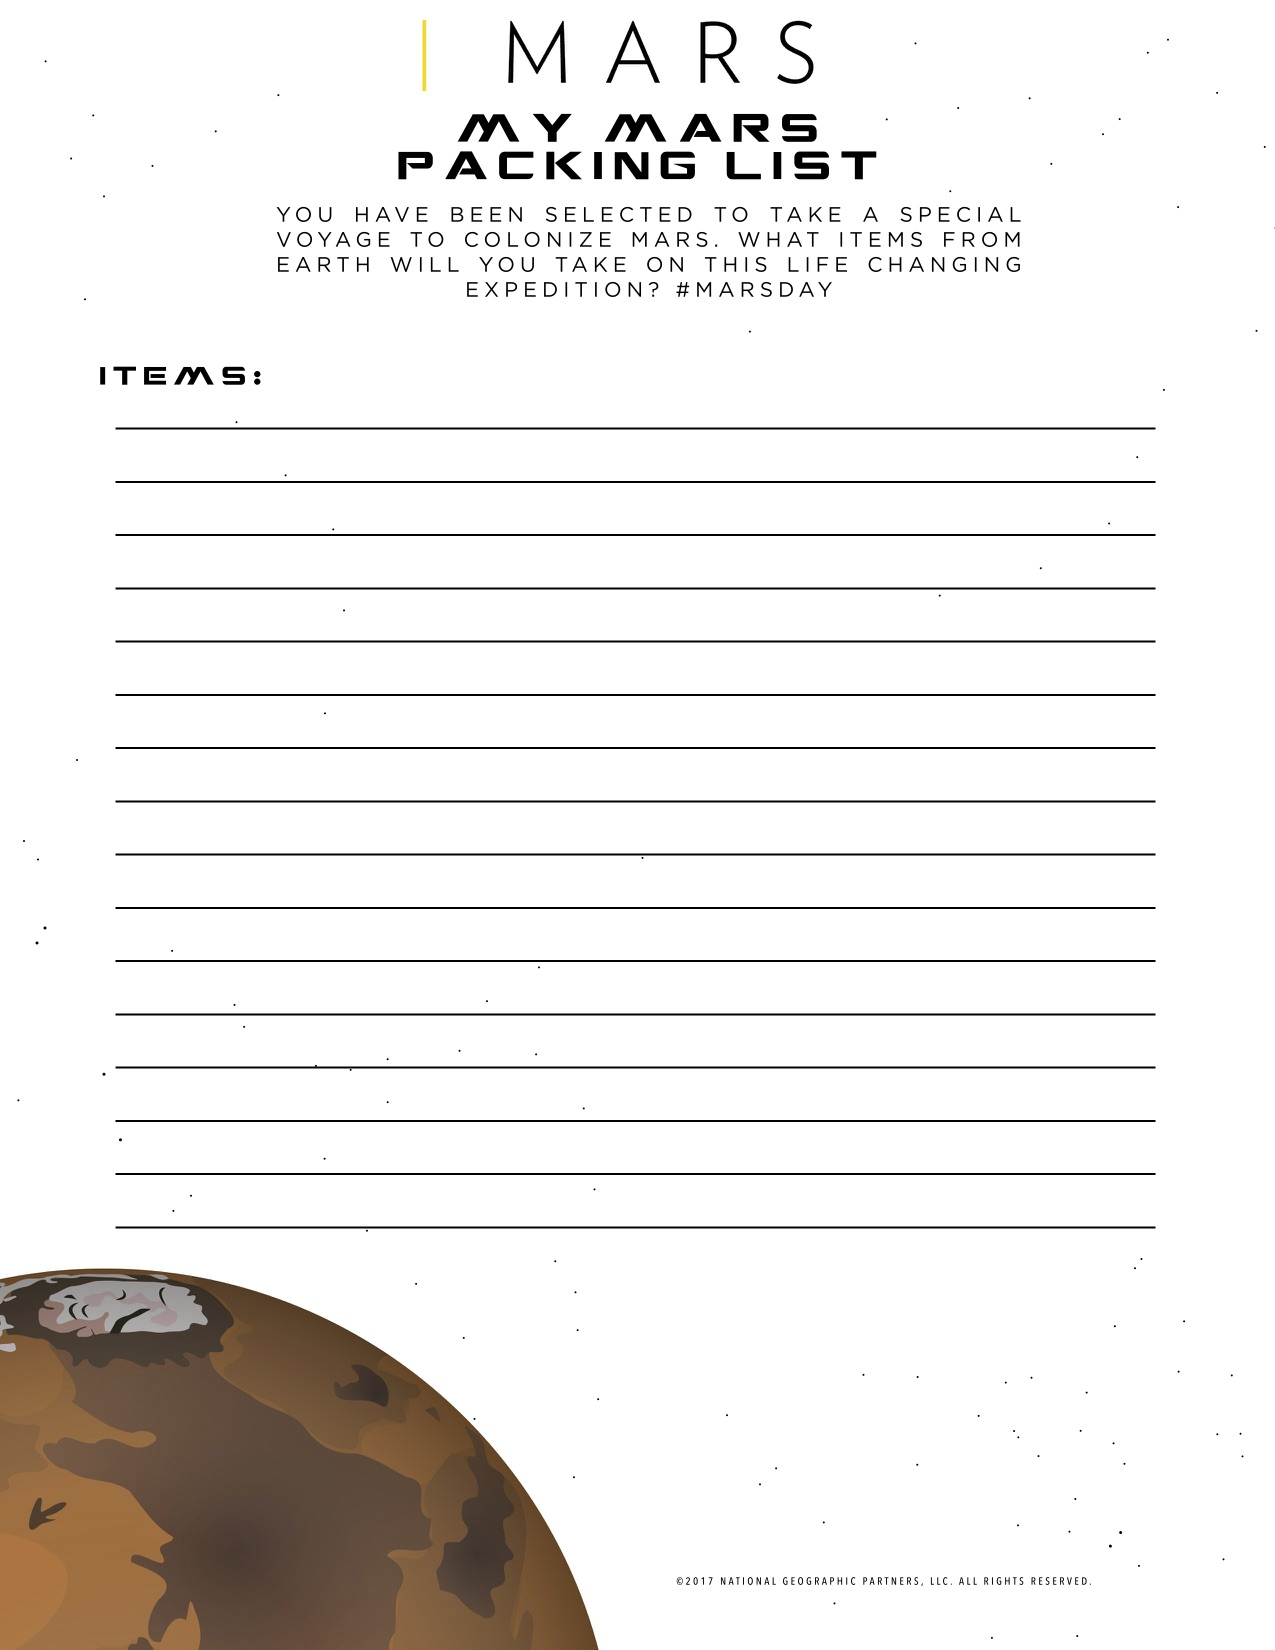 Mars Packing List